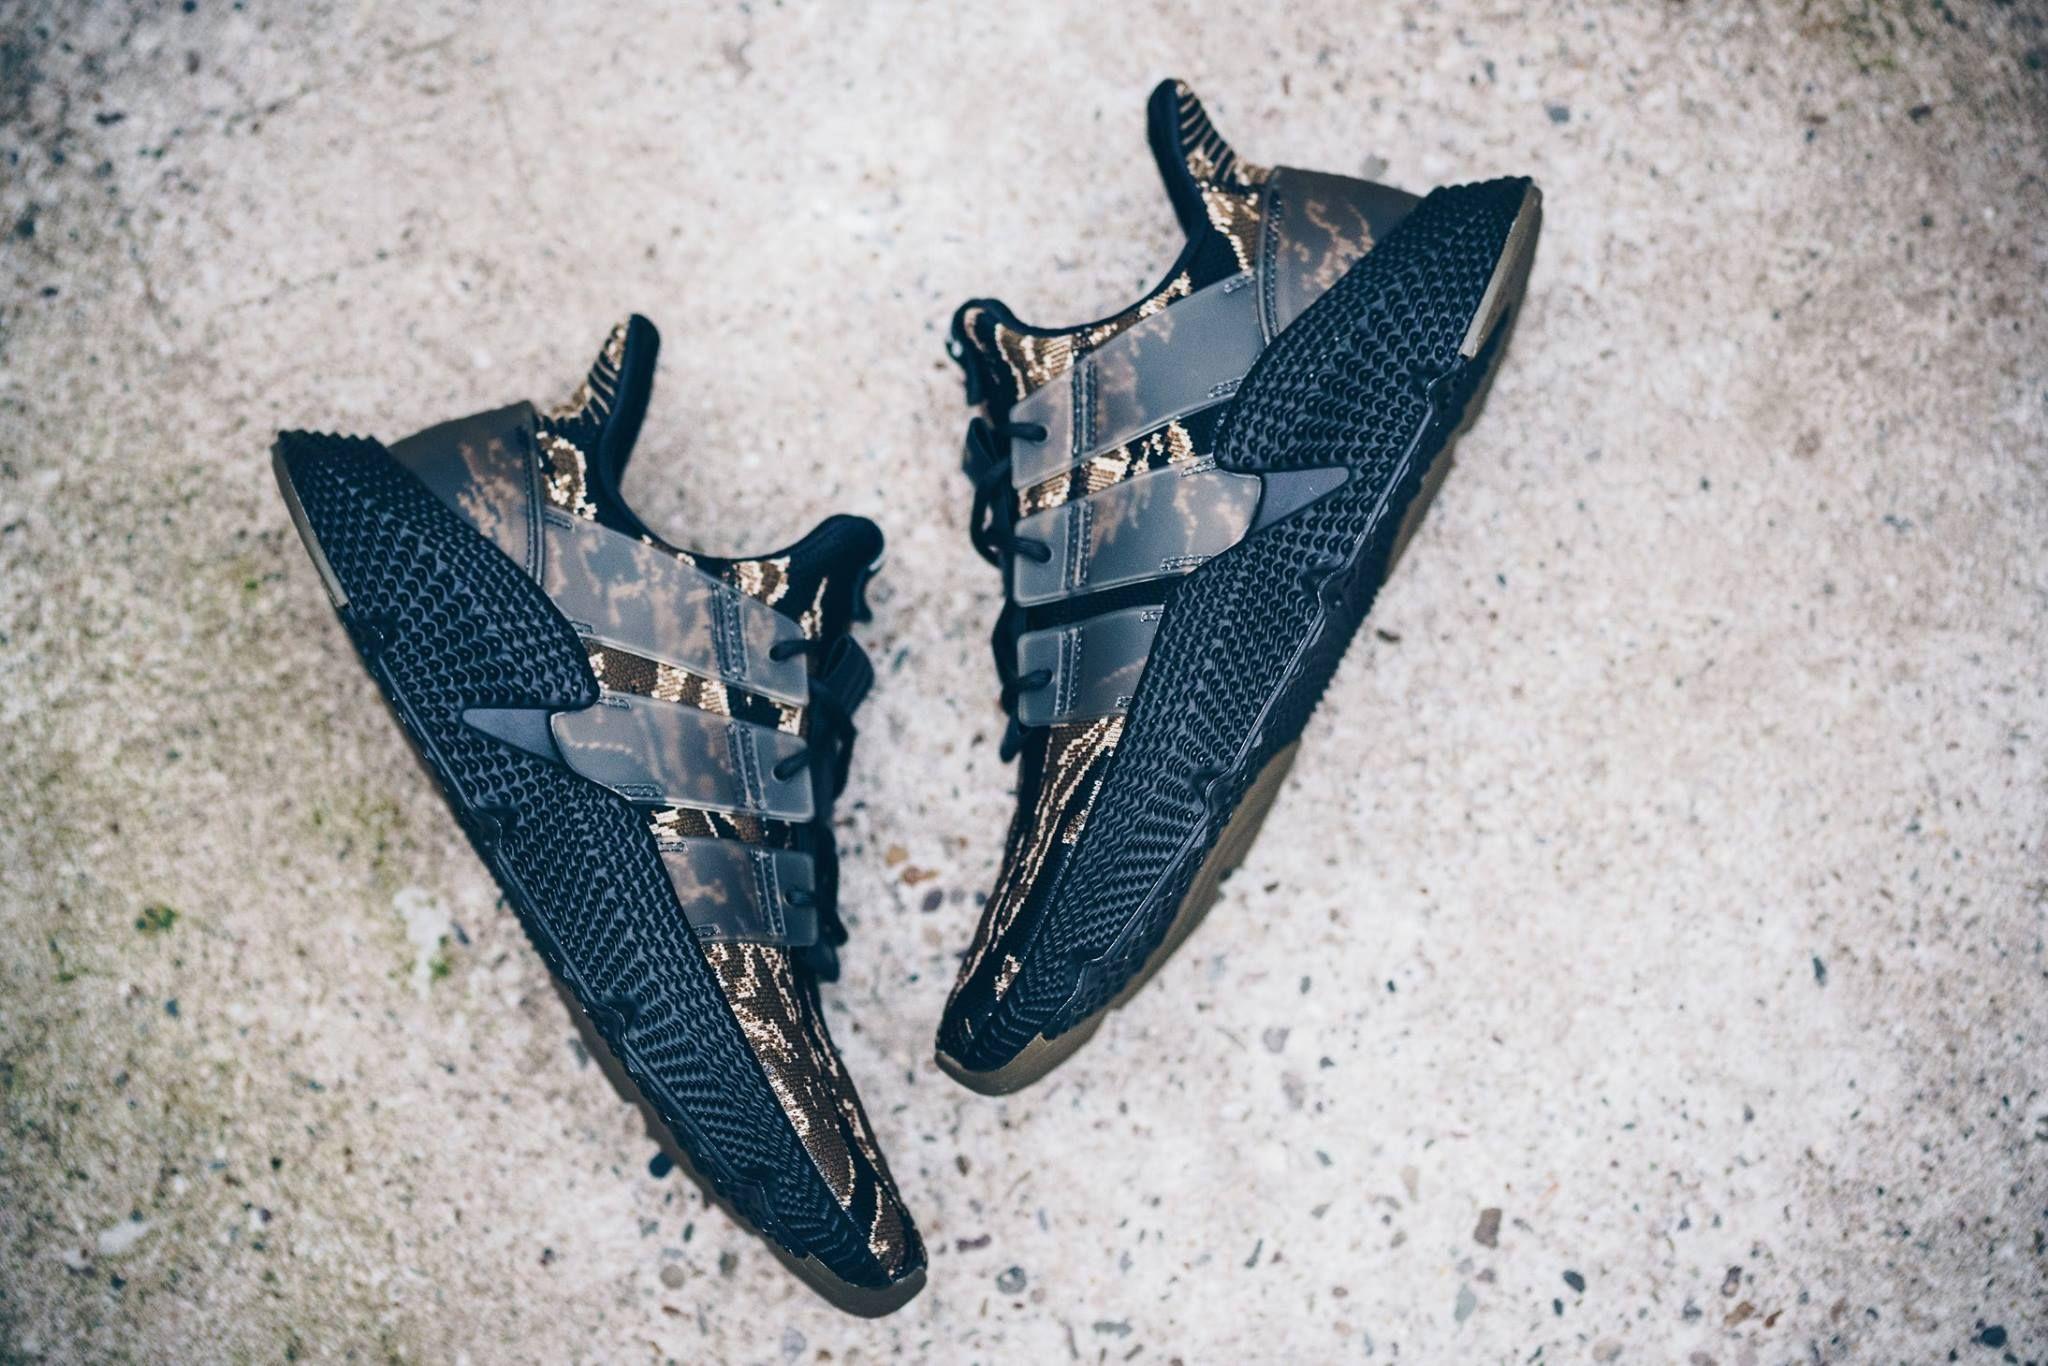 Kanye Yeezy West x adidas Originals Yeezy Kanye Temporada 1 editorial aparece 993611